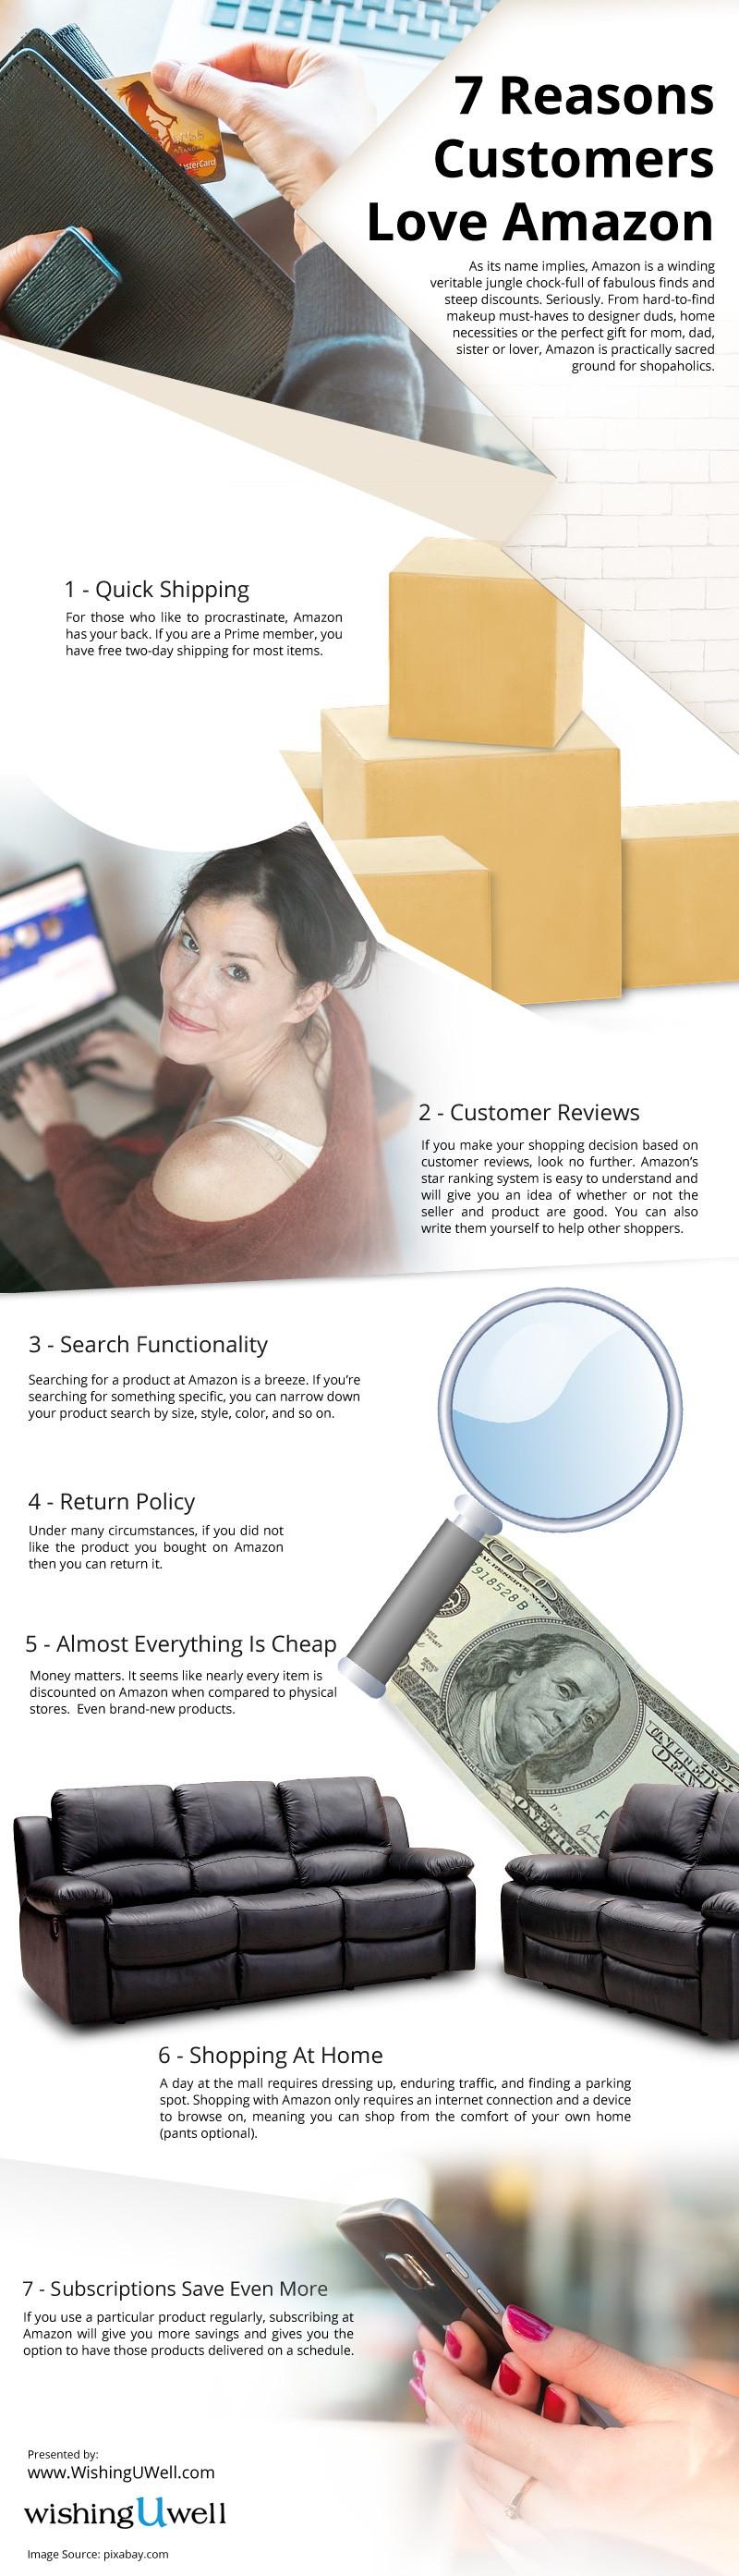 Reasons-Customers-Love-Amazon Infographic